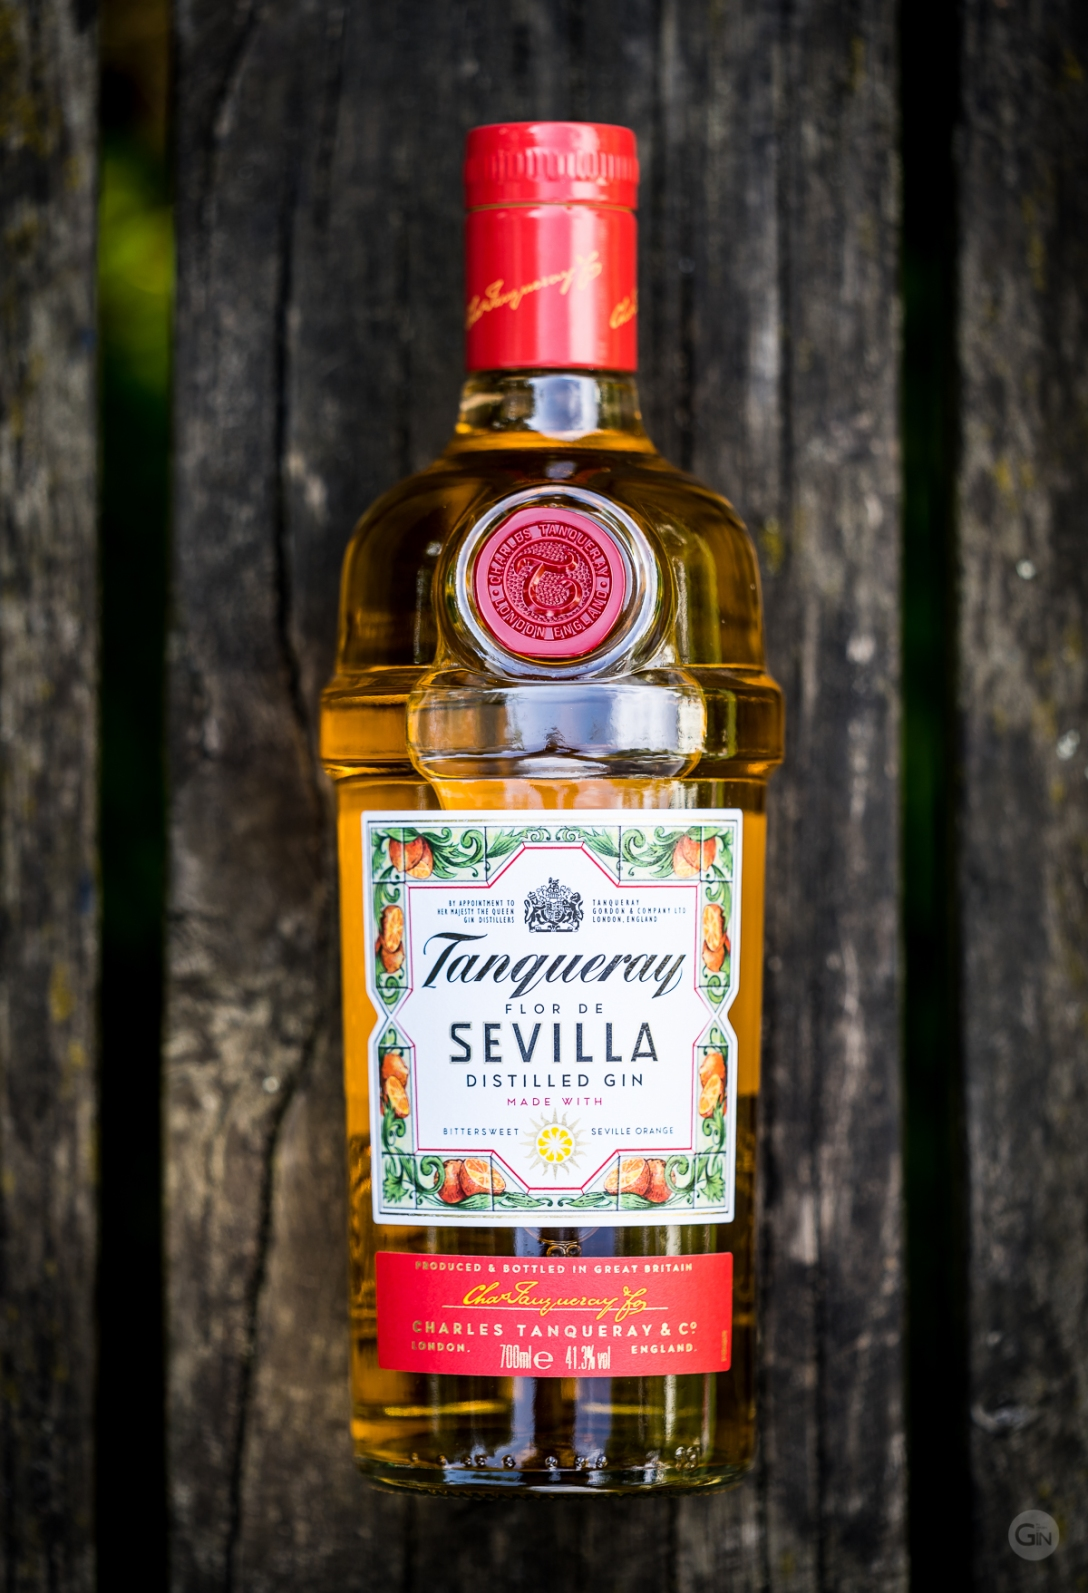 Tanqueray Flor de Sevilla negroni. Photo by Michael Sperling.